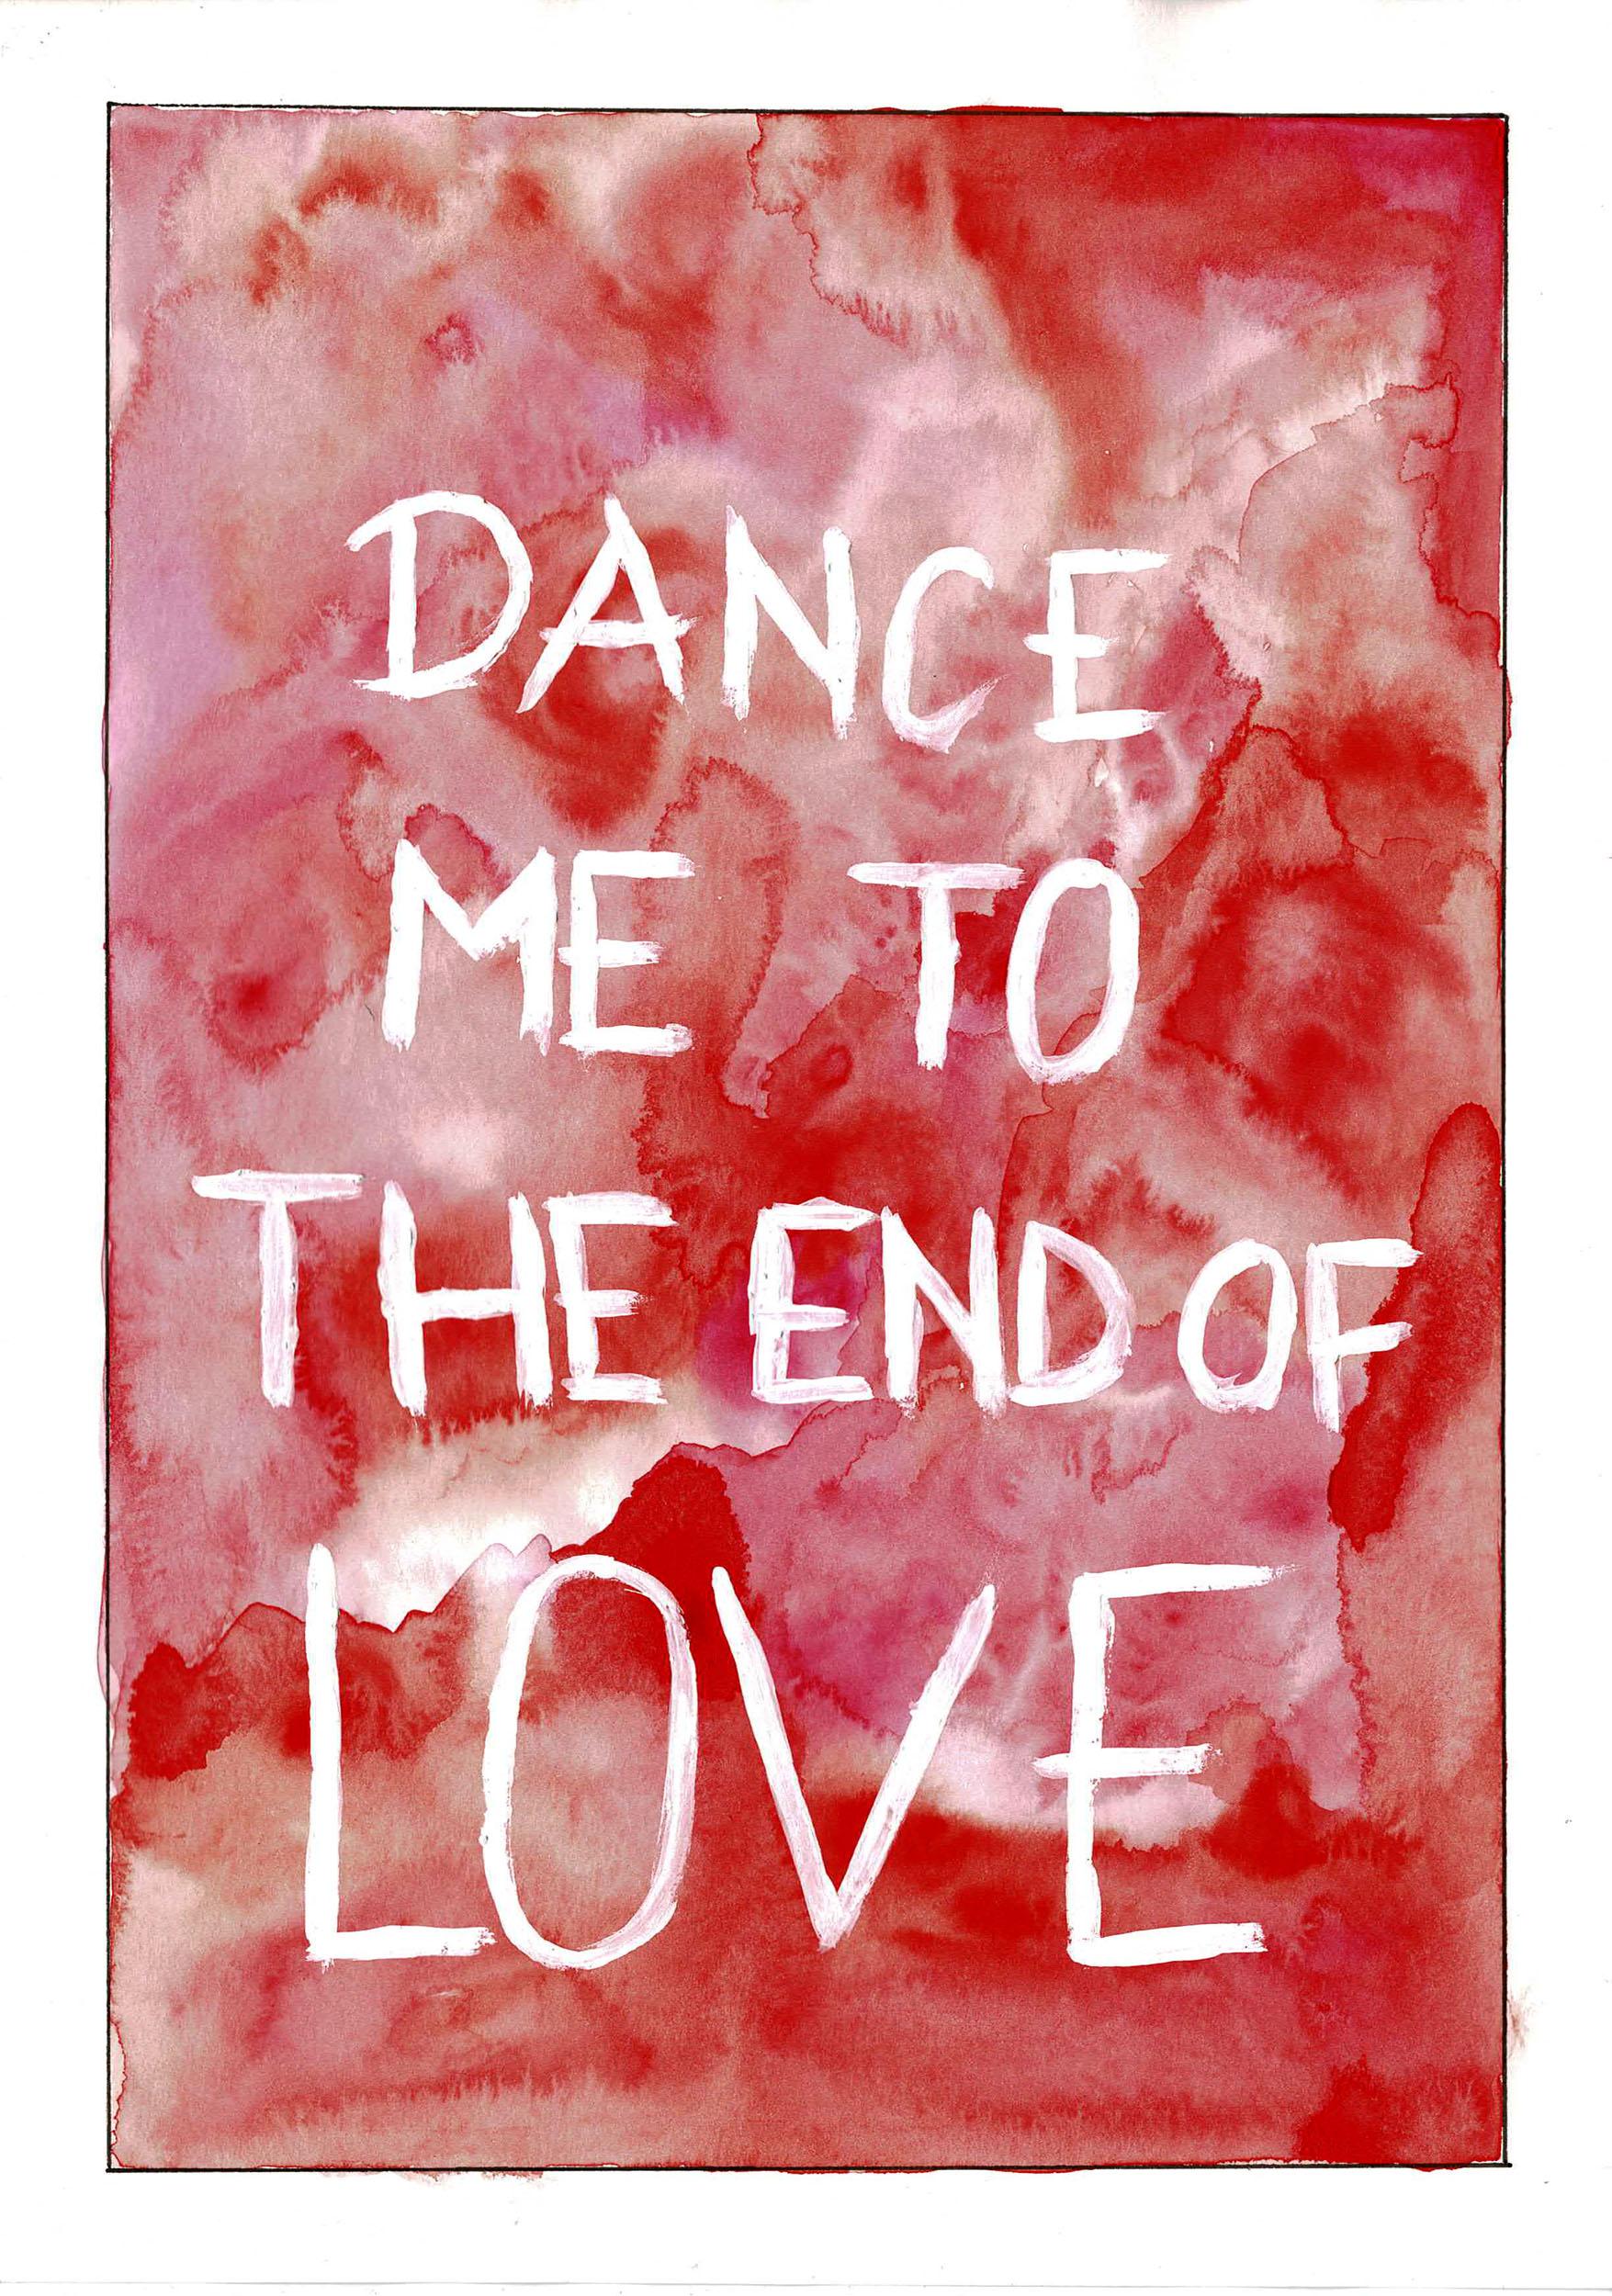 Isabel_Vidal_Sola_Dance_me_0003_Fondo